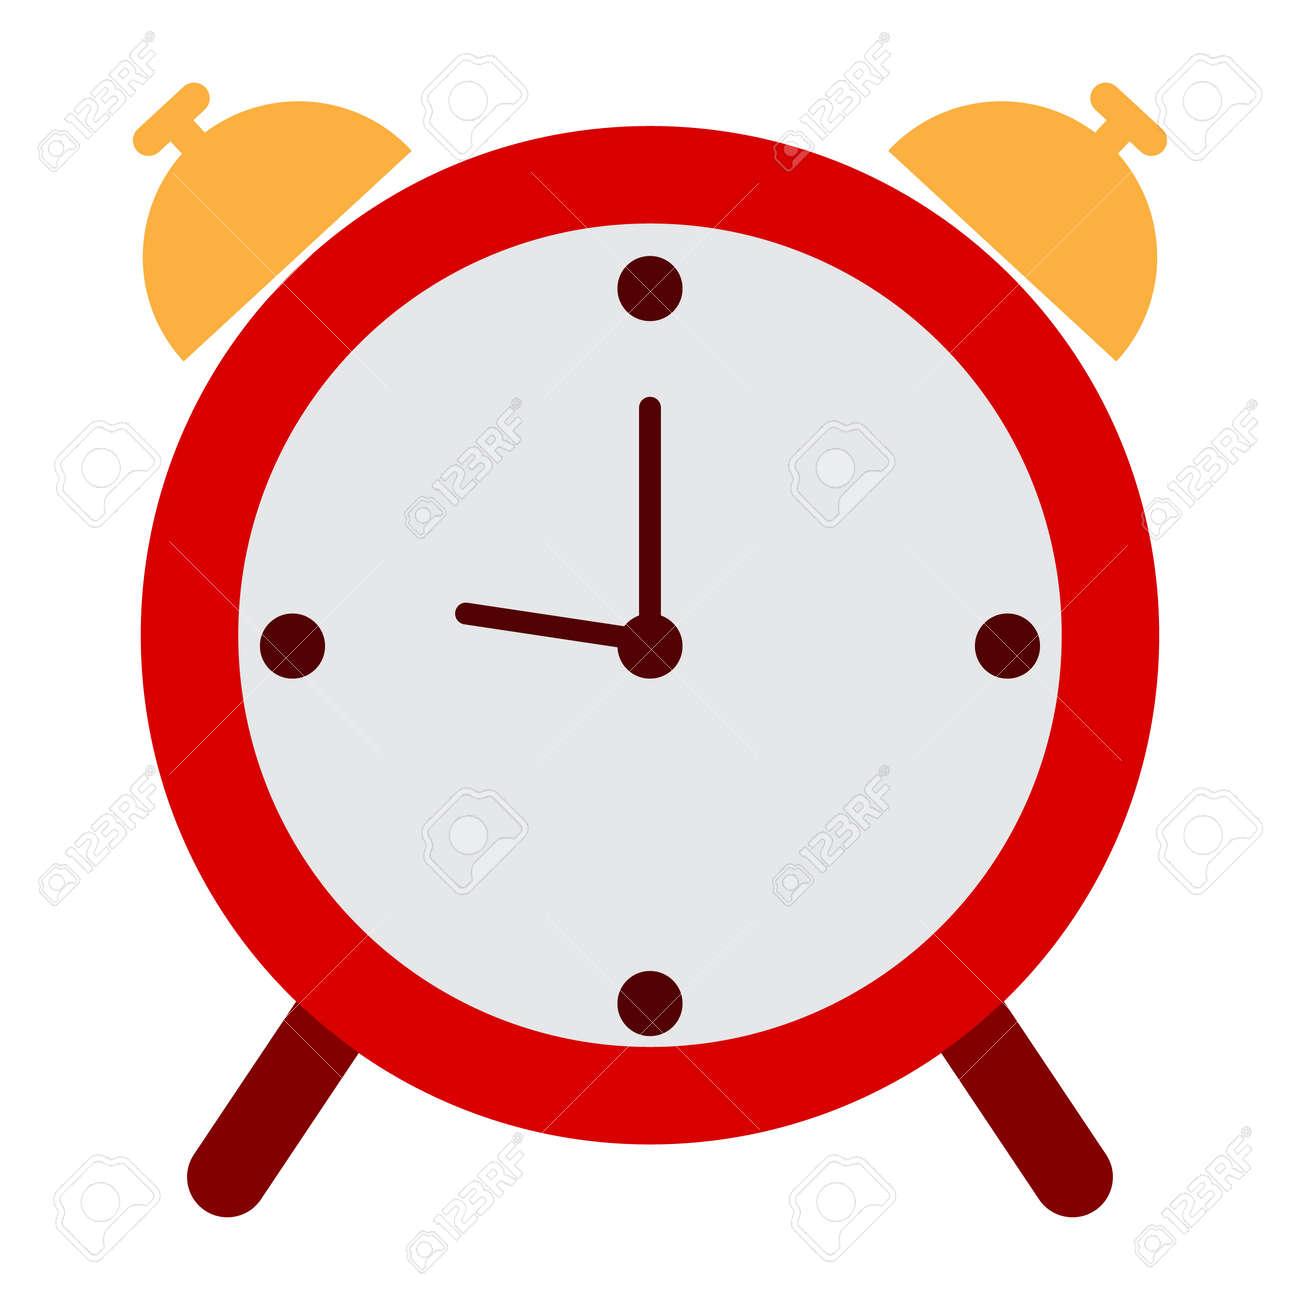 alarm clock icon vector illustration flat style design isolated rh 123rf com calendar clock icons vector alarm clock icon vector free